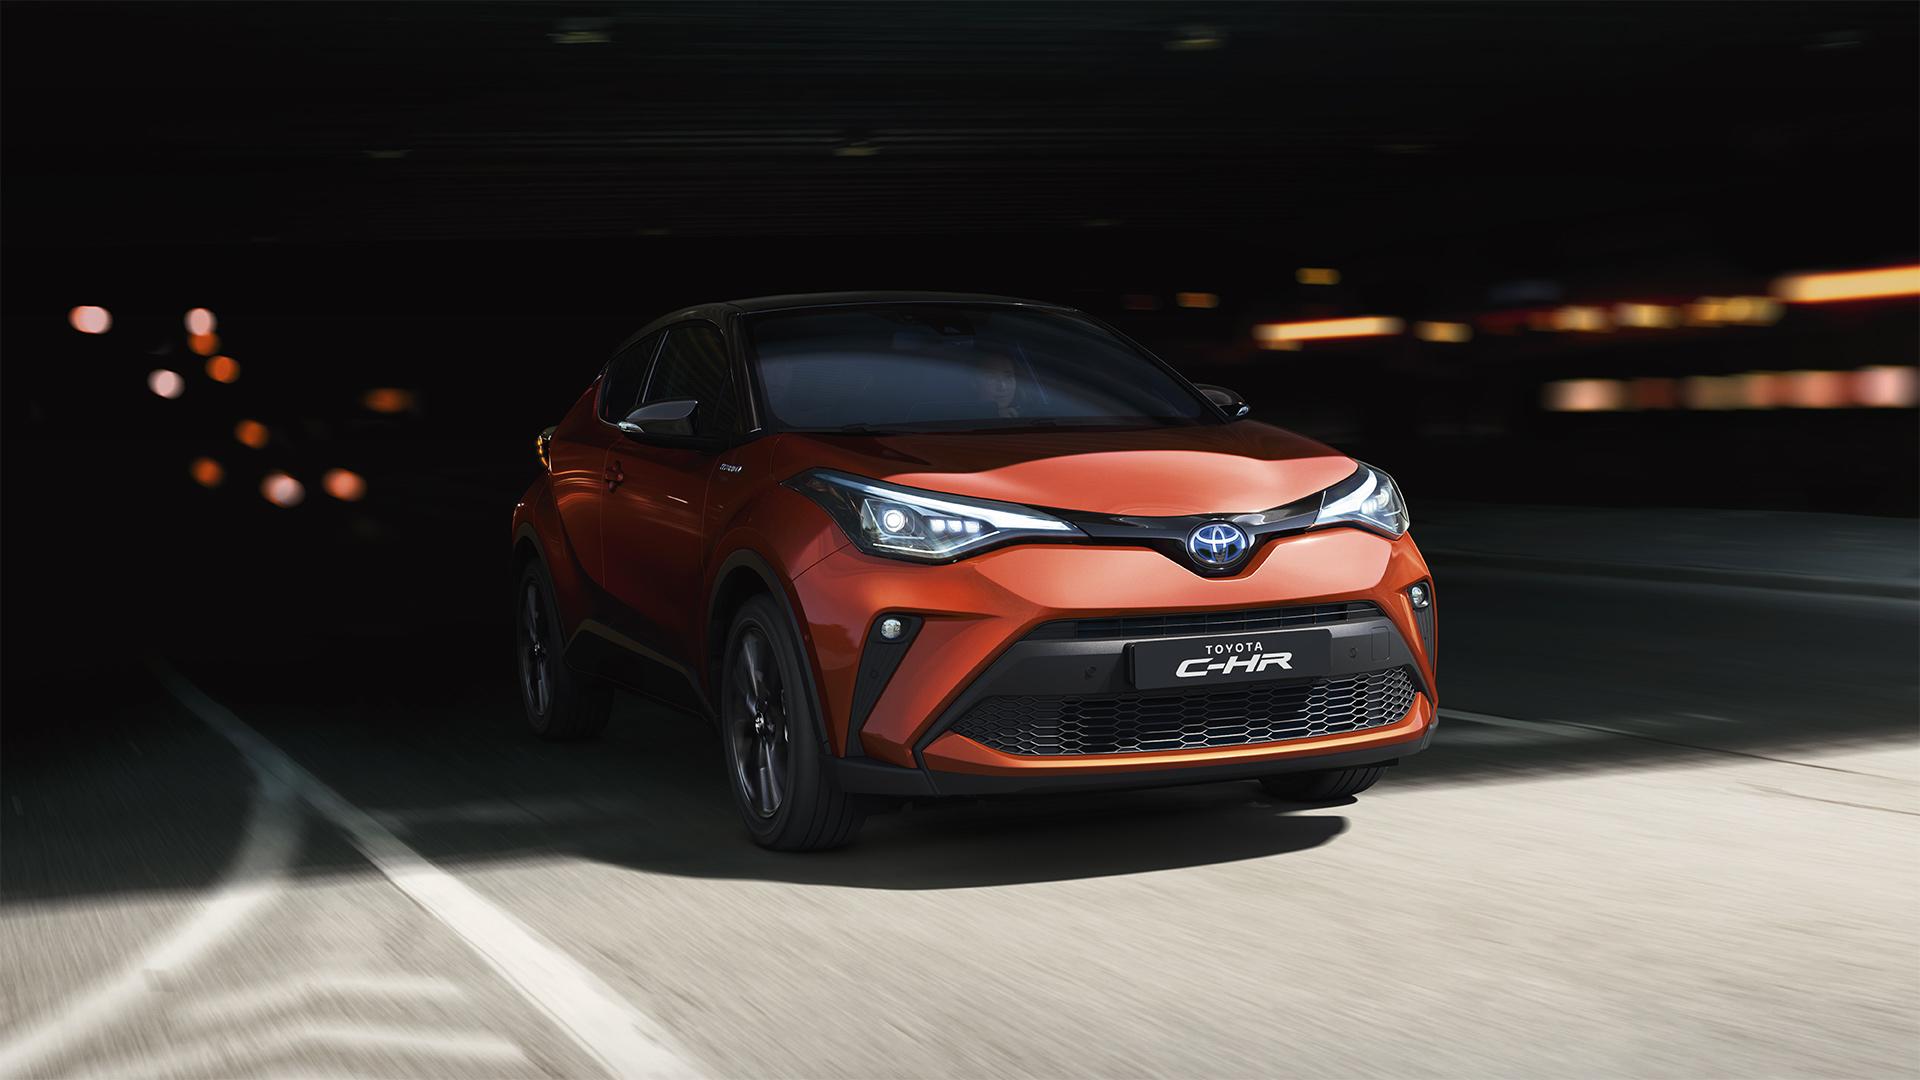 Toyota-c-hr-2019-gallery-001-full tcm-22-1776324